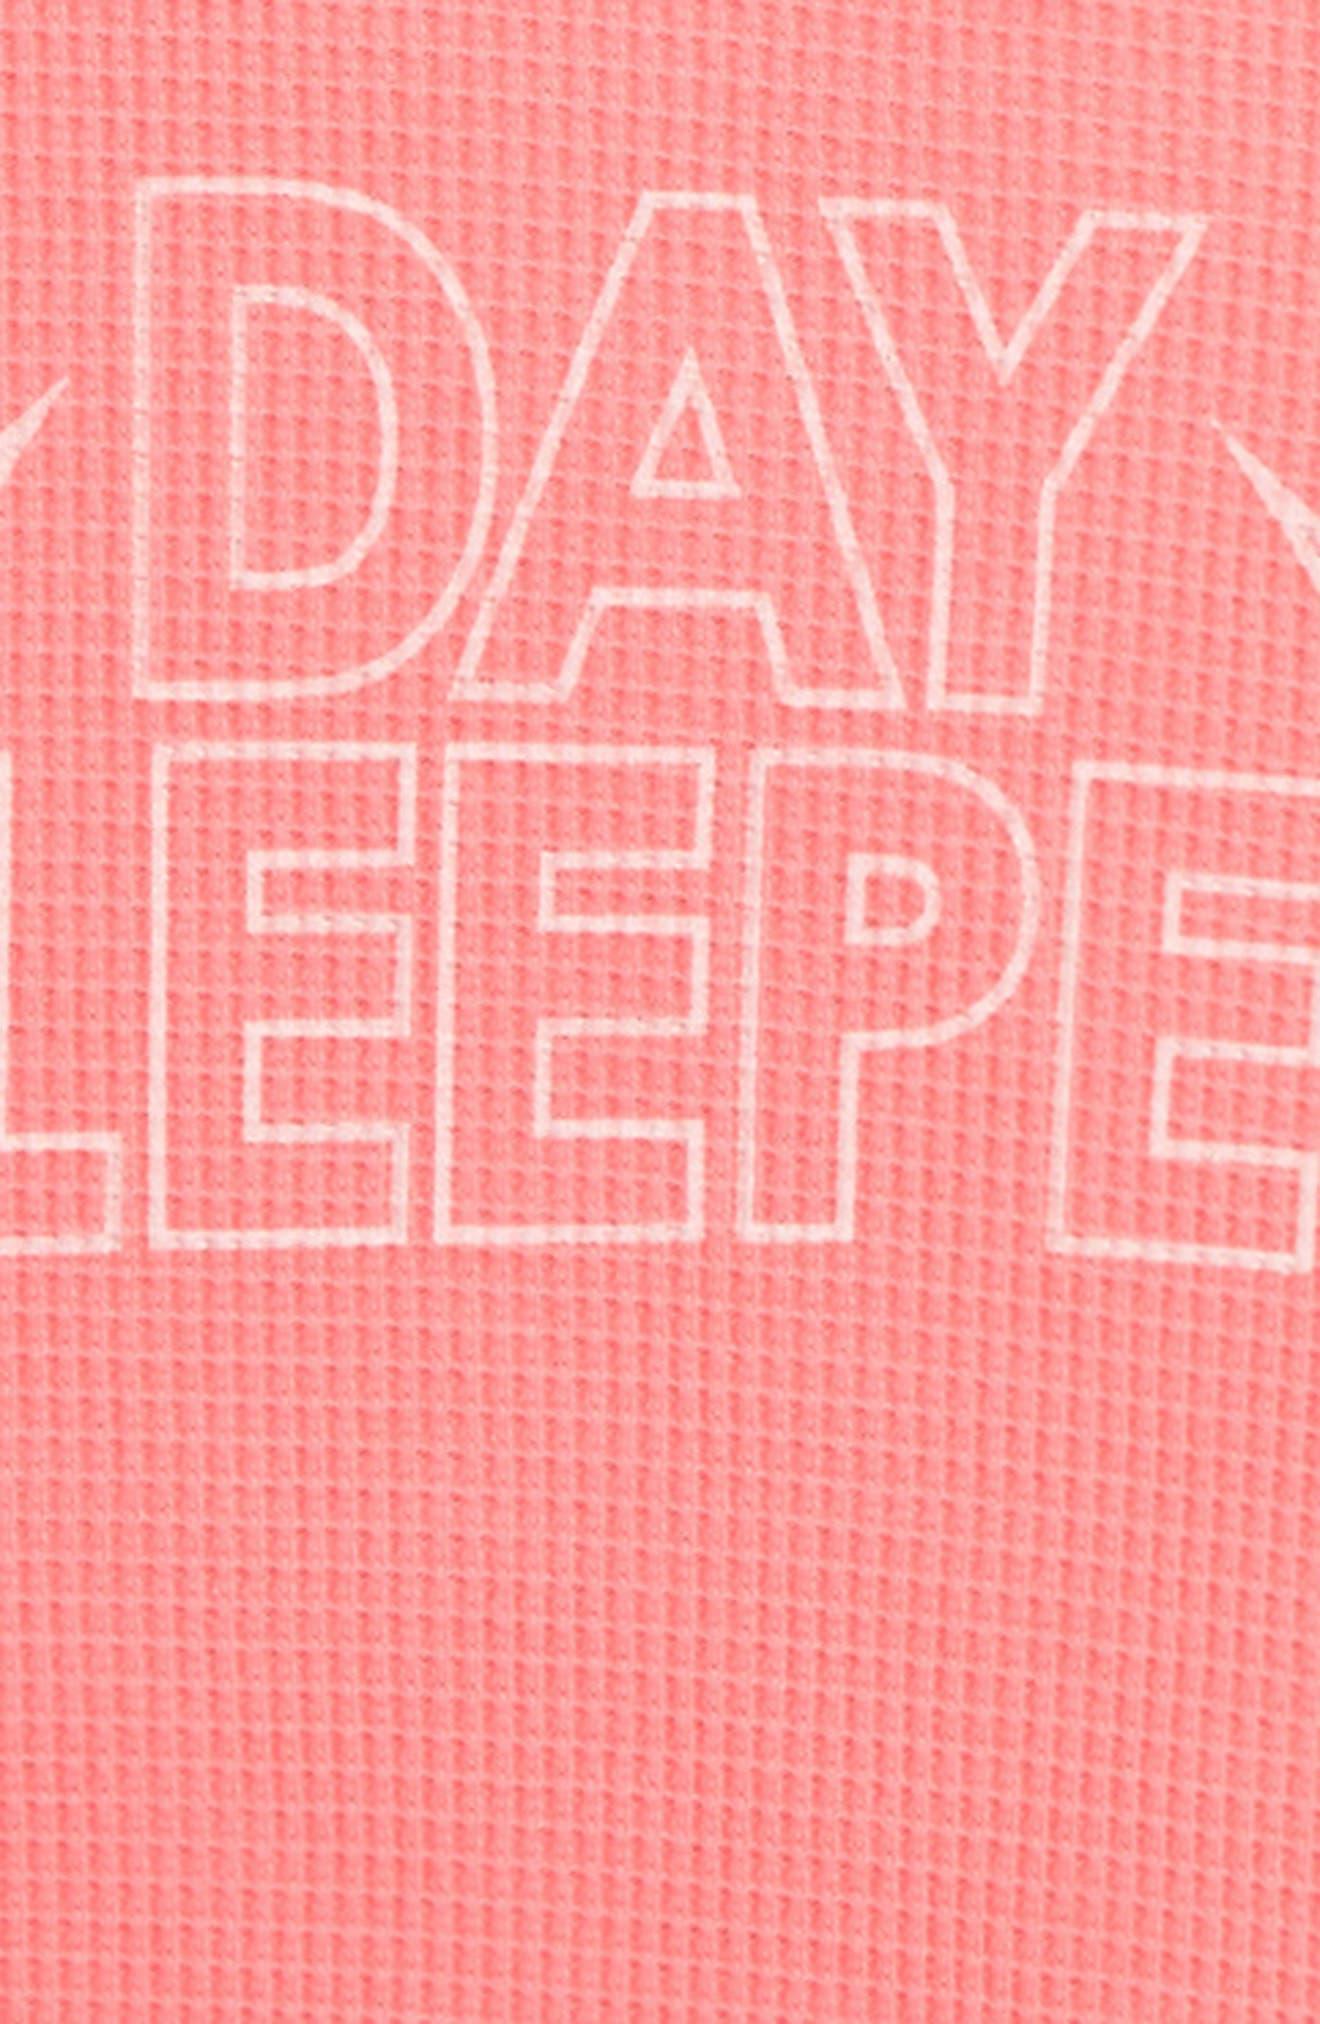 Alternate Image 2  - Wildfox Day Sleeper Thermal Top (Big Girls)